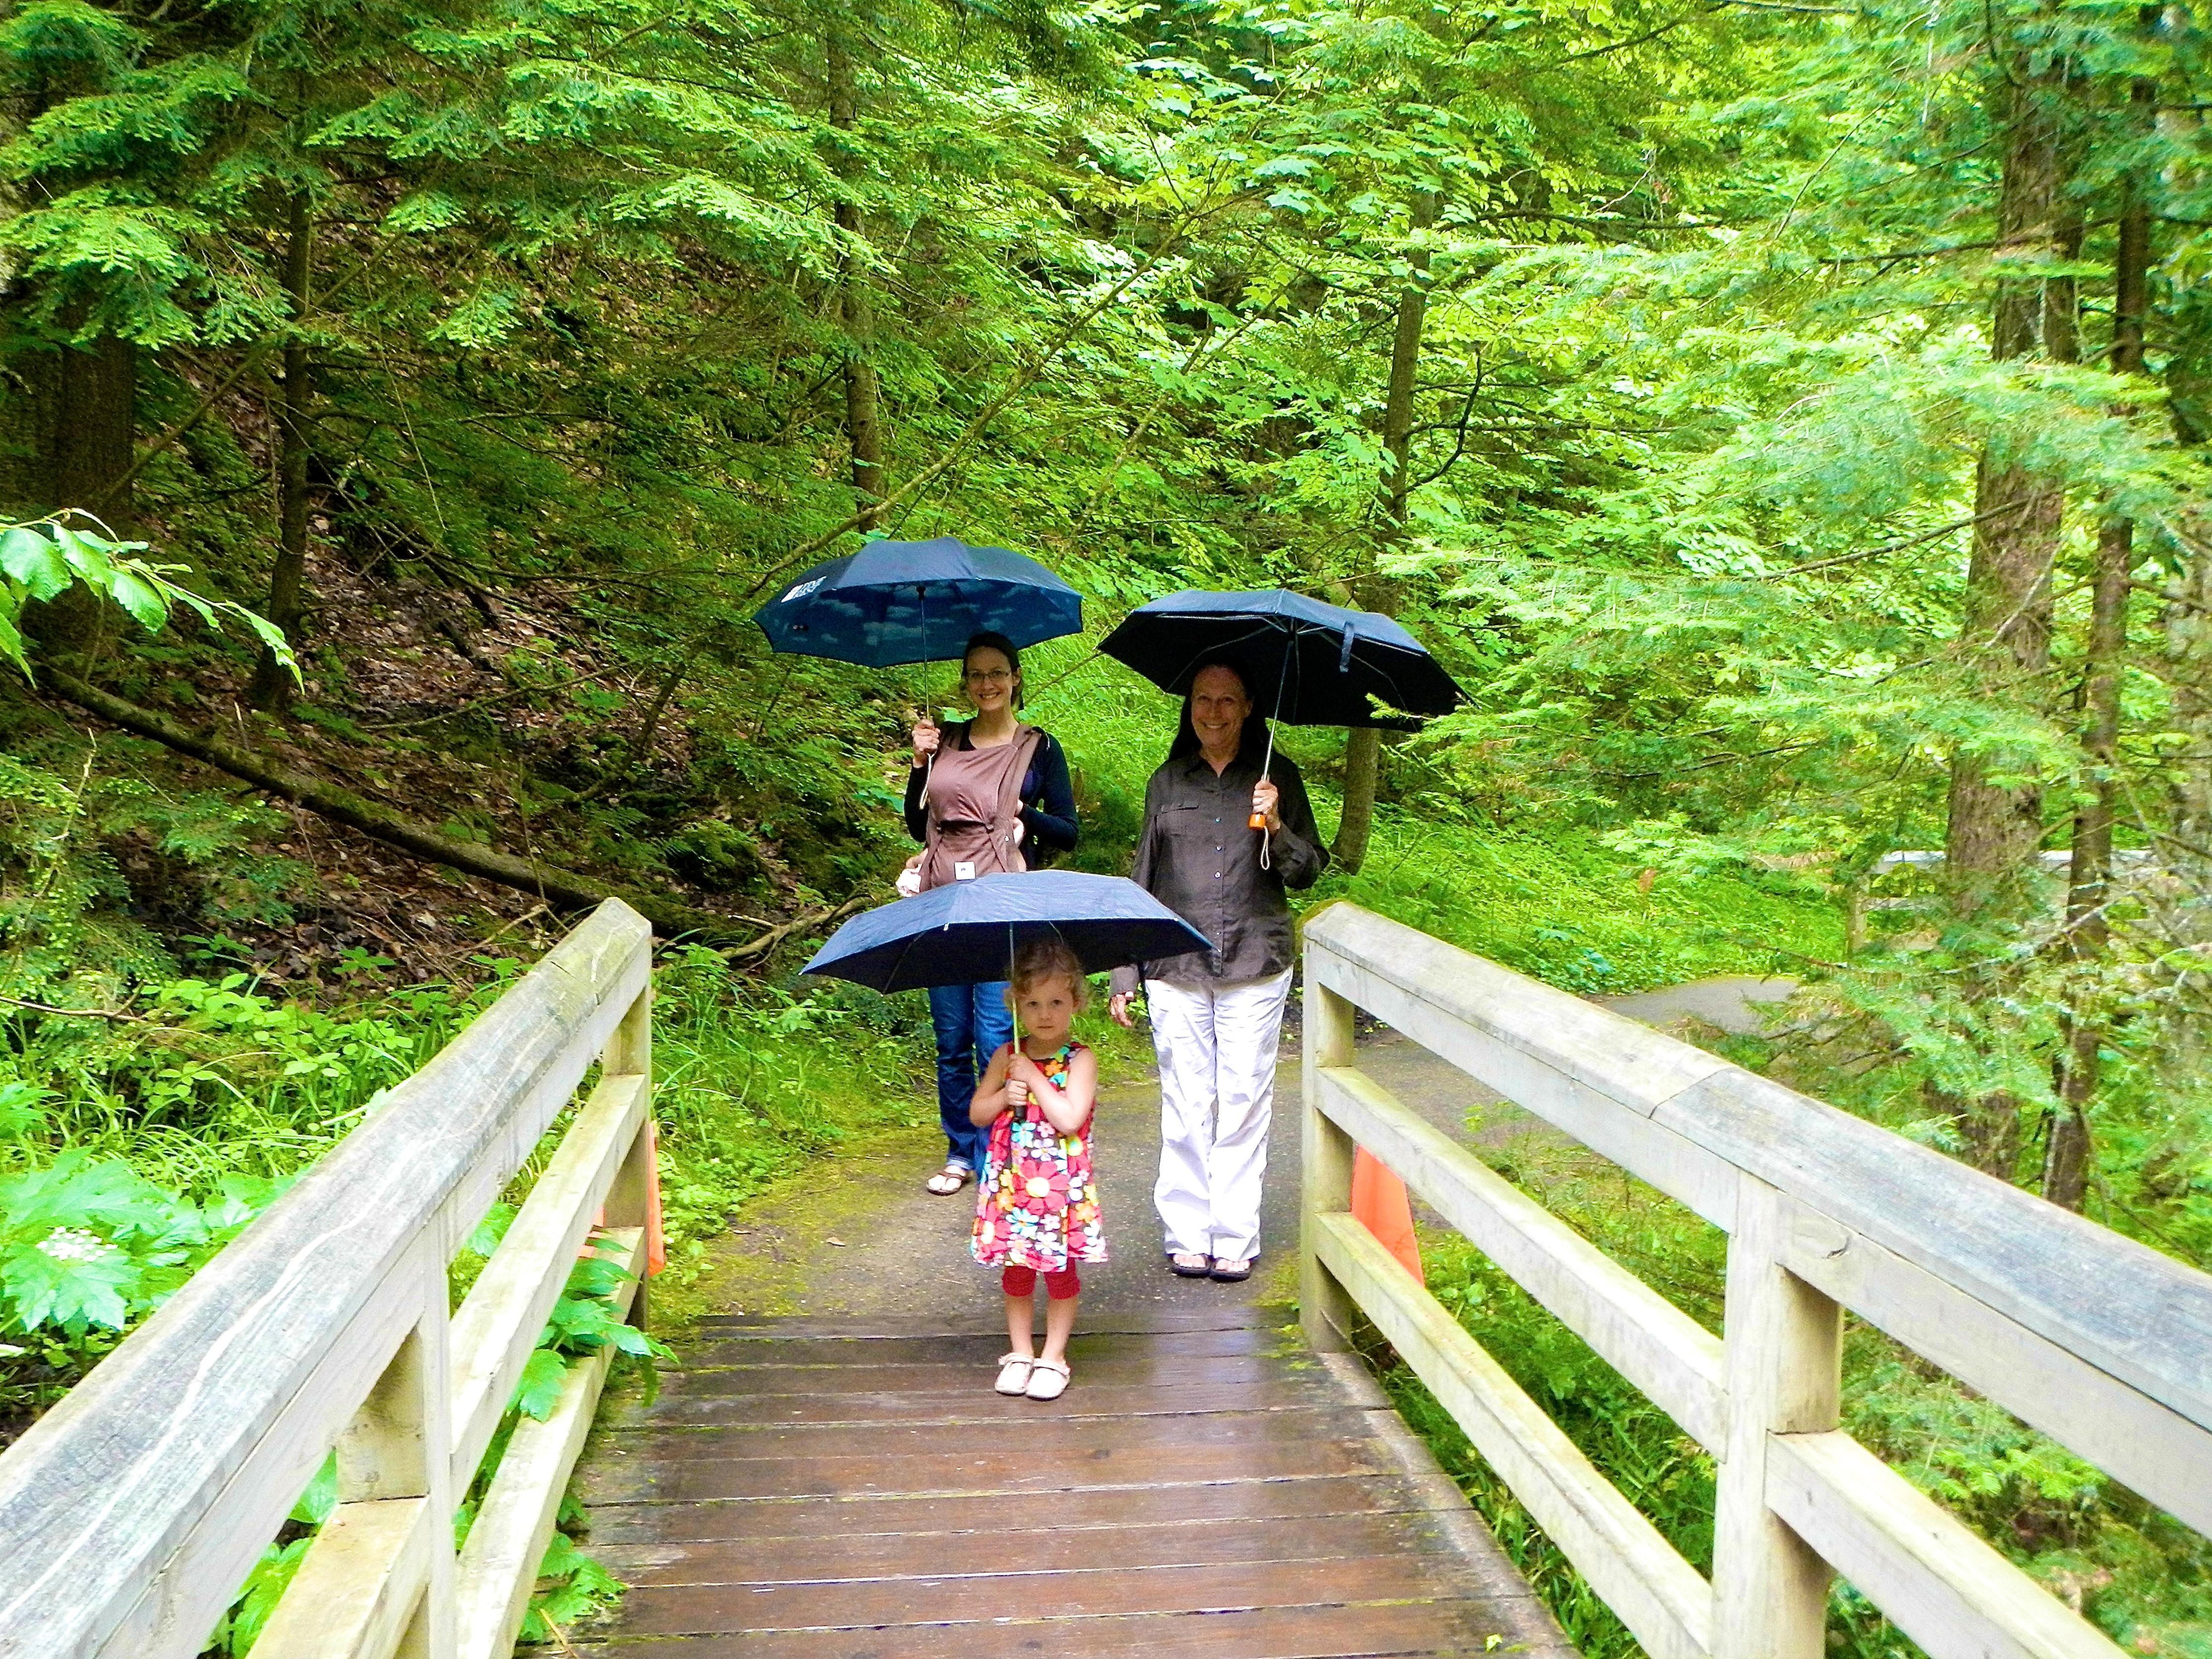 Rainy Day walk at Munising Falls 4